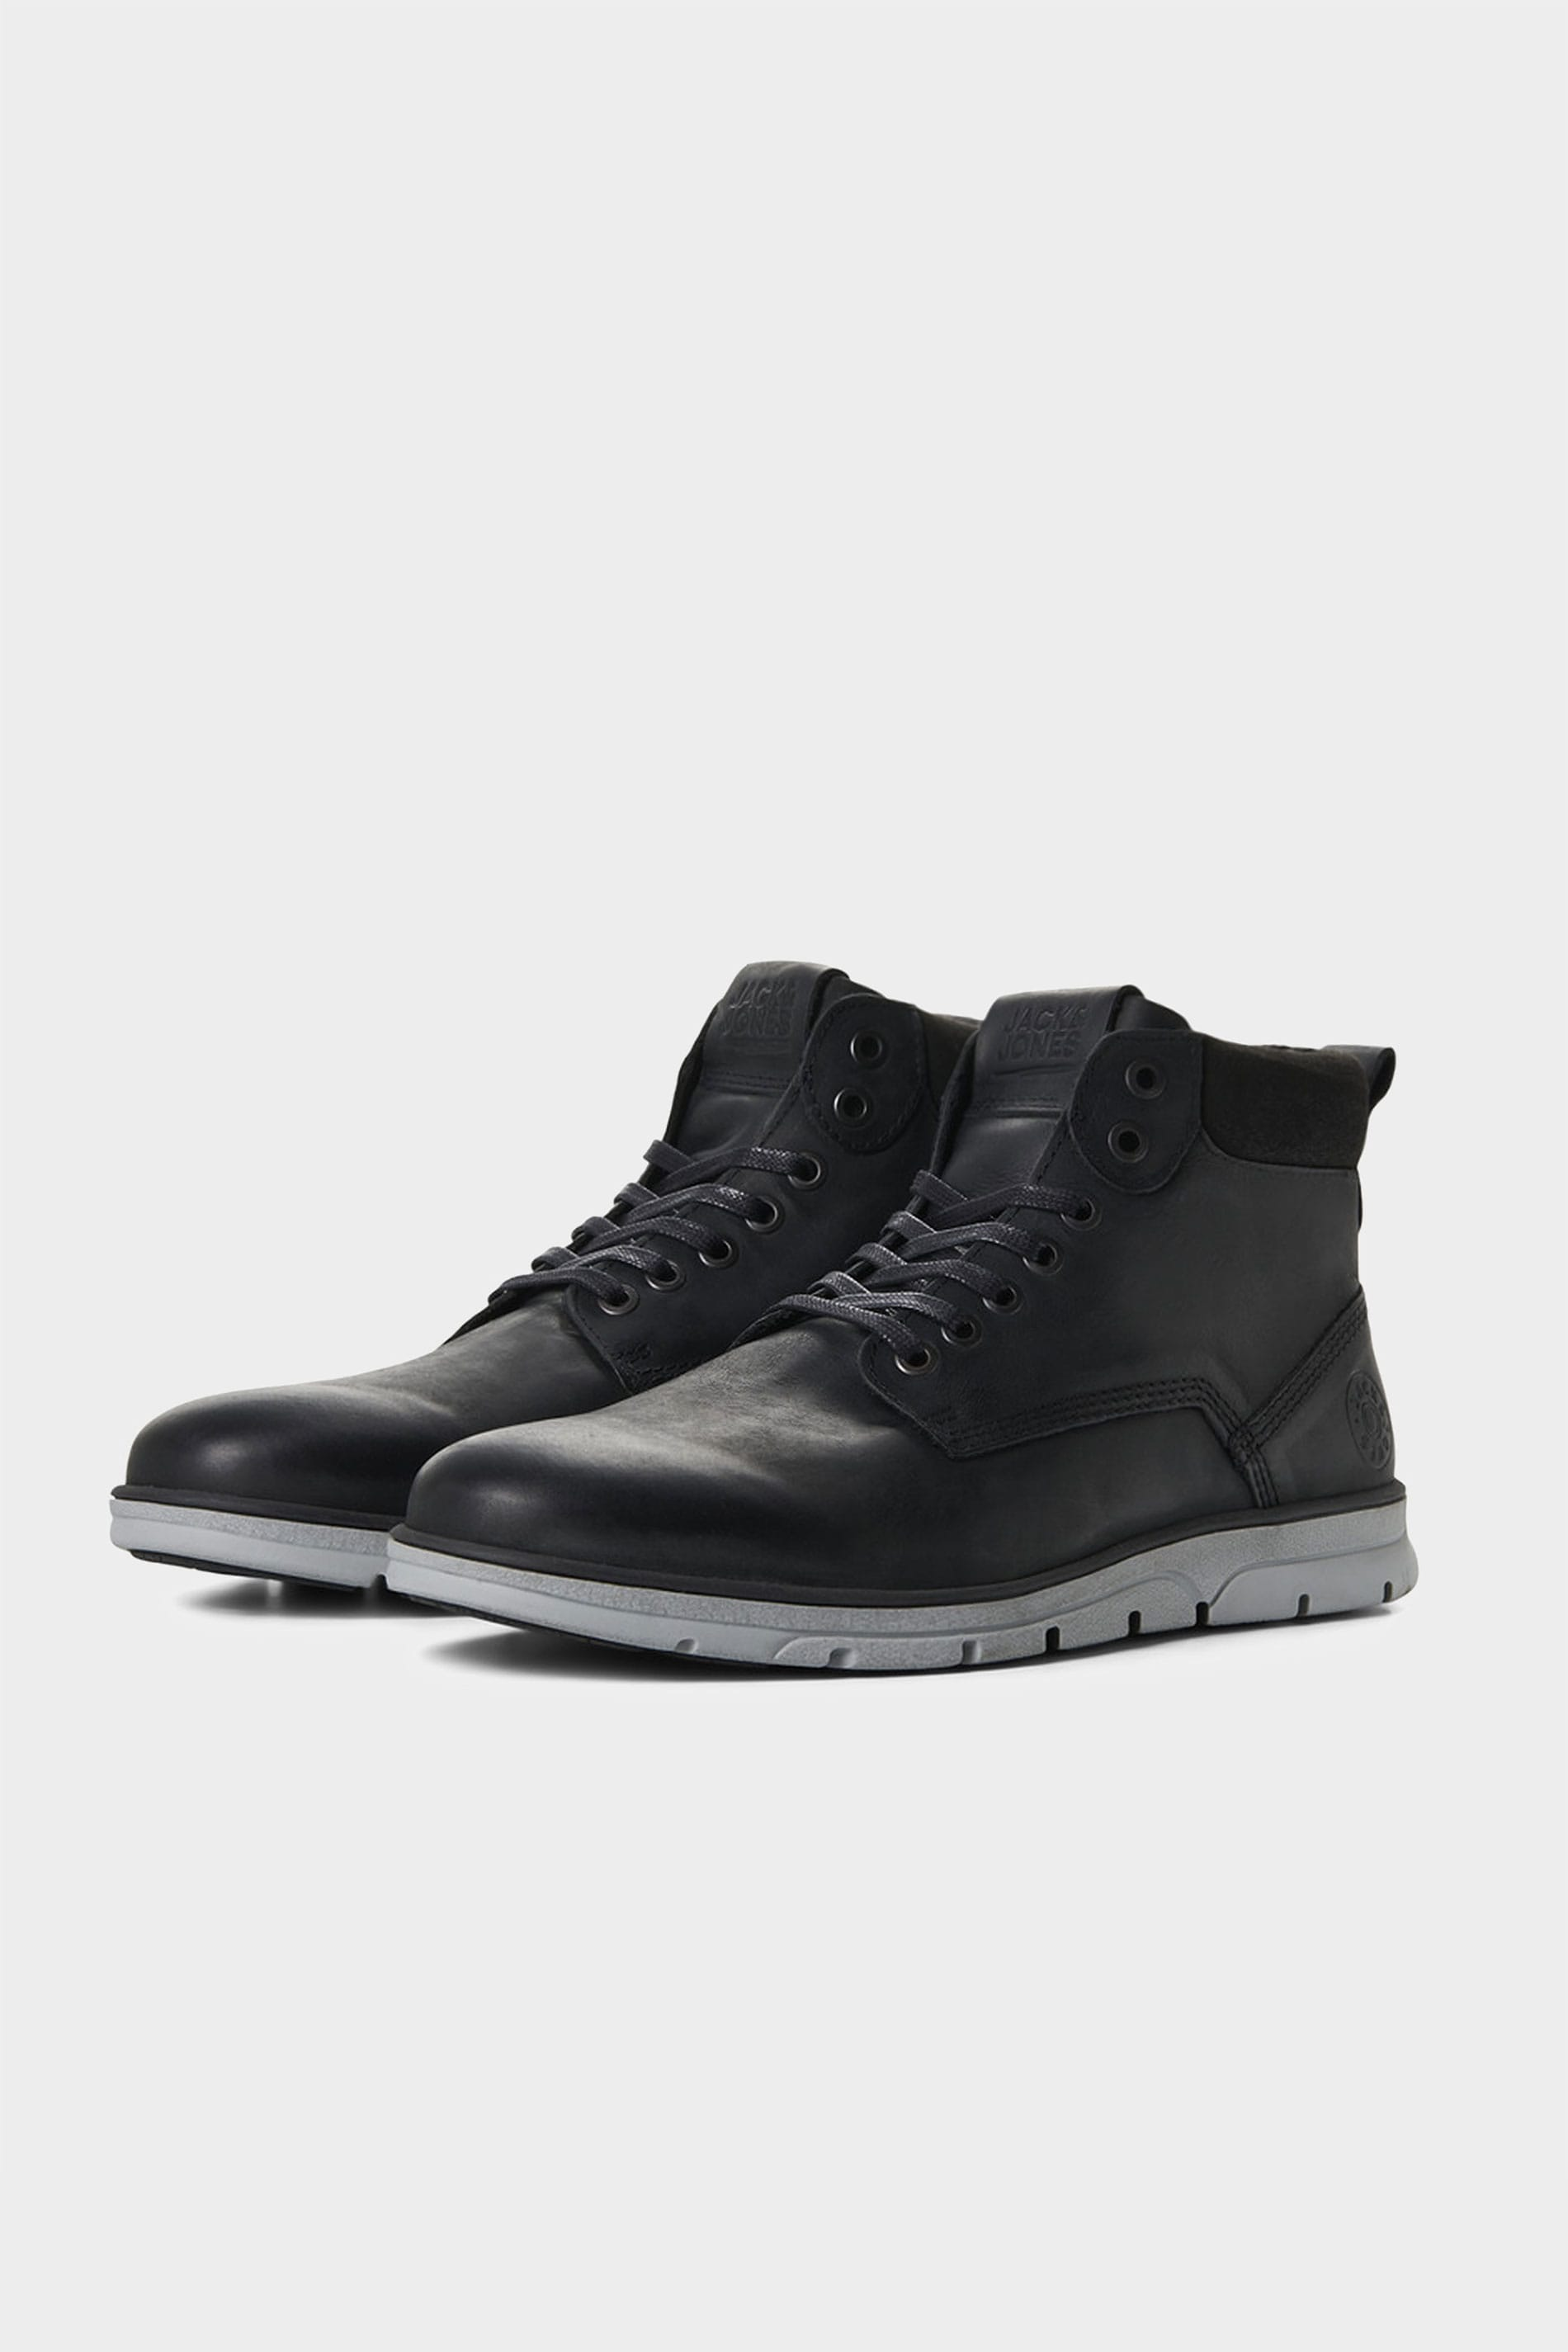 JACK & JONES Black Leather Boots